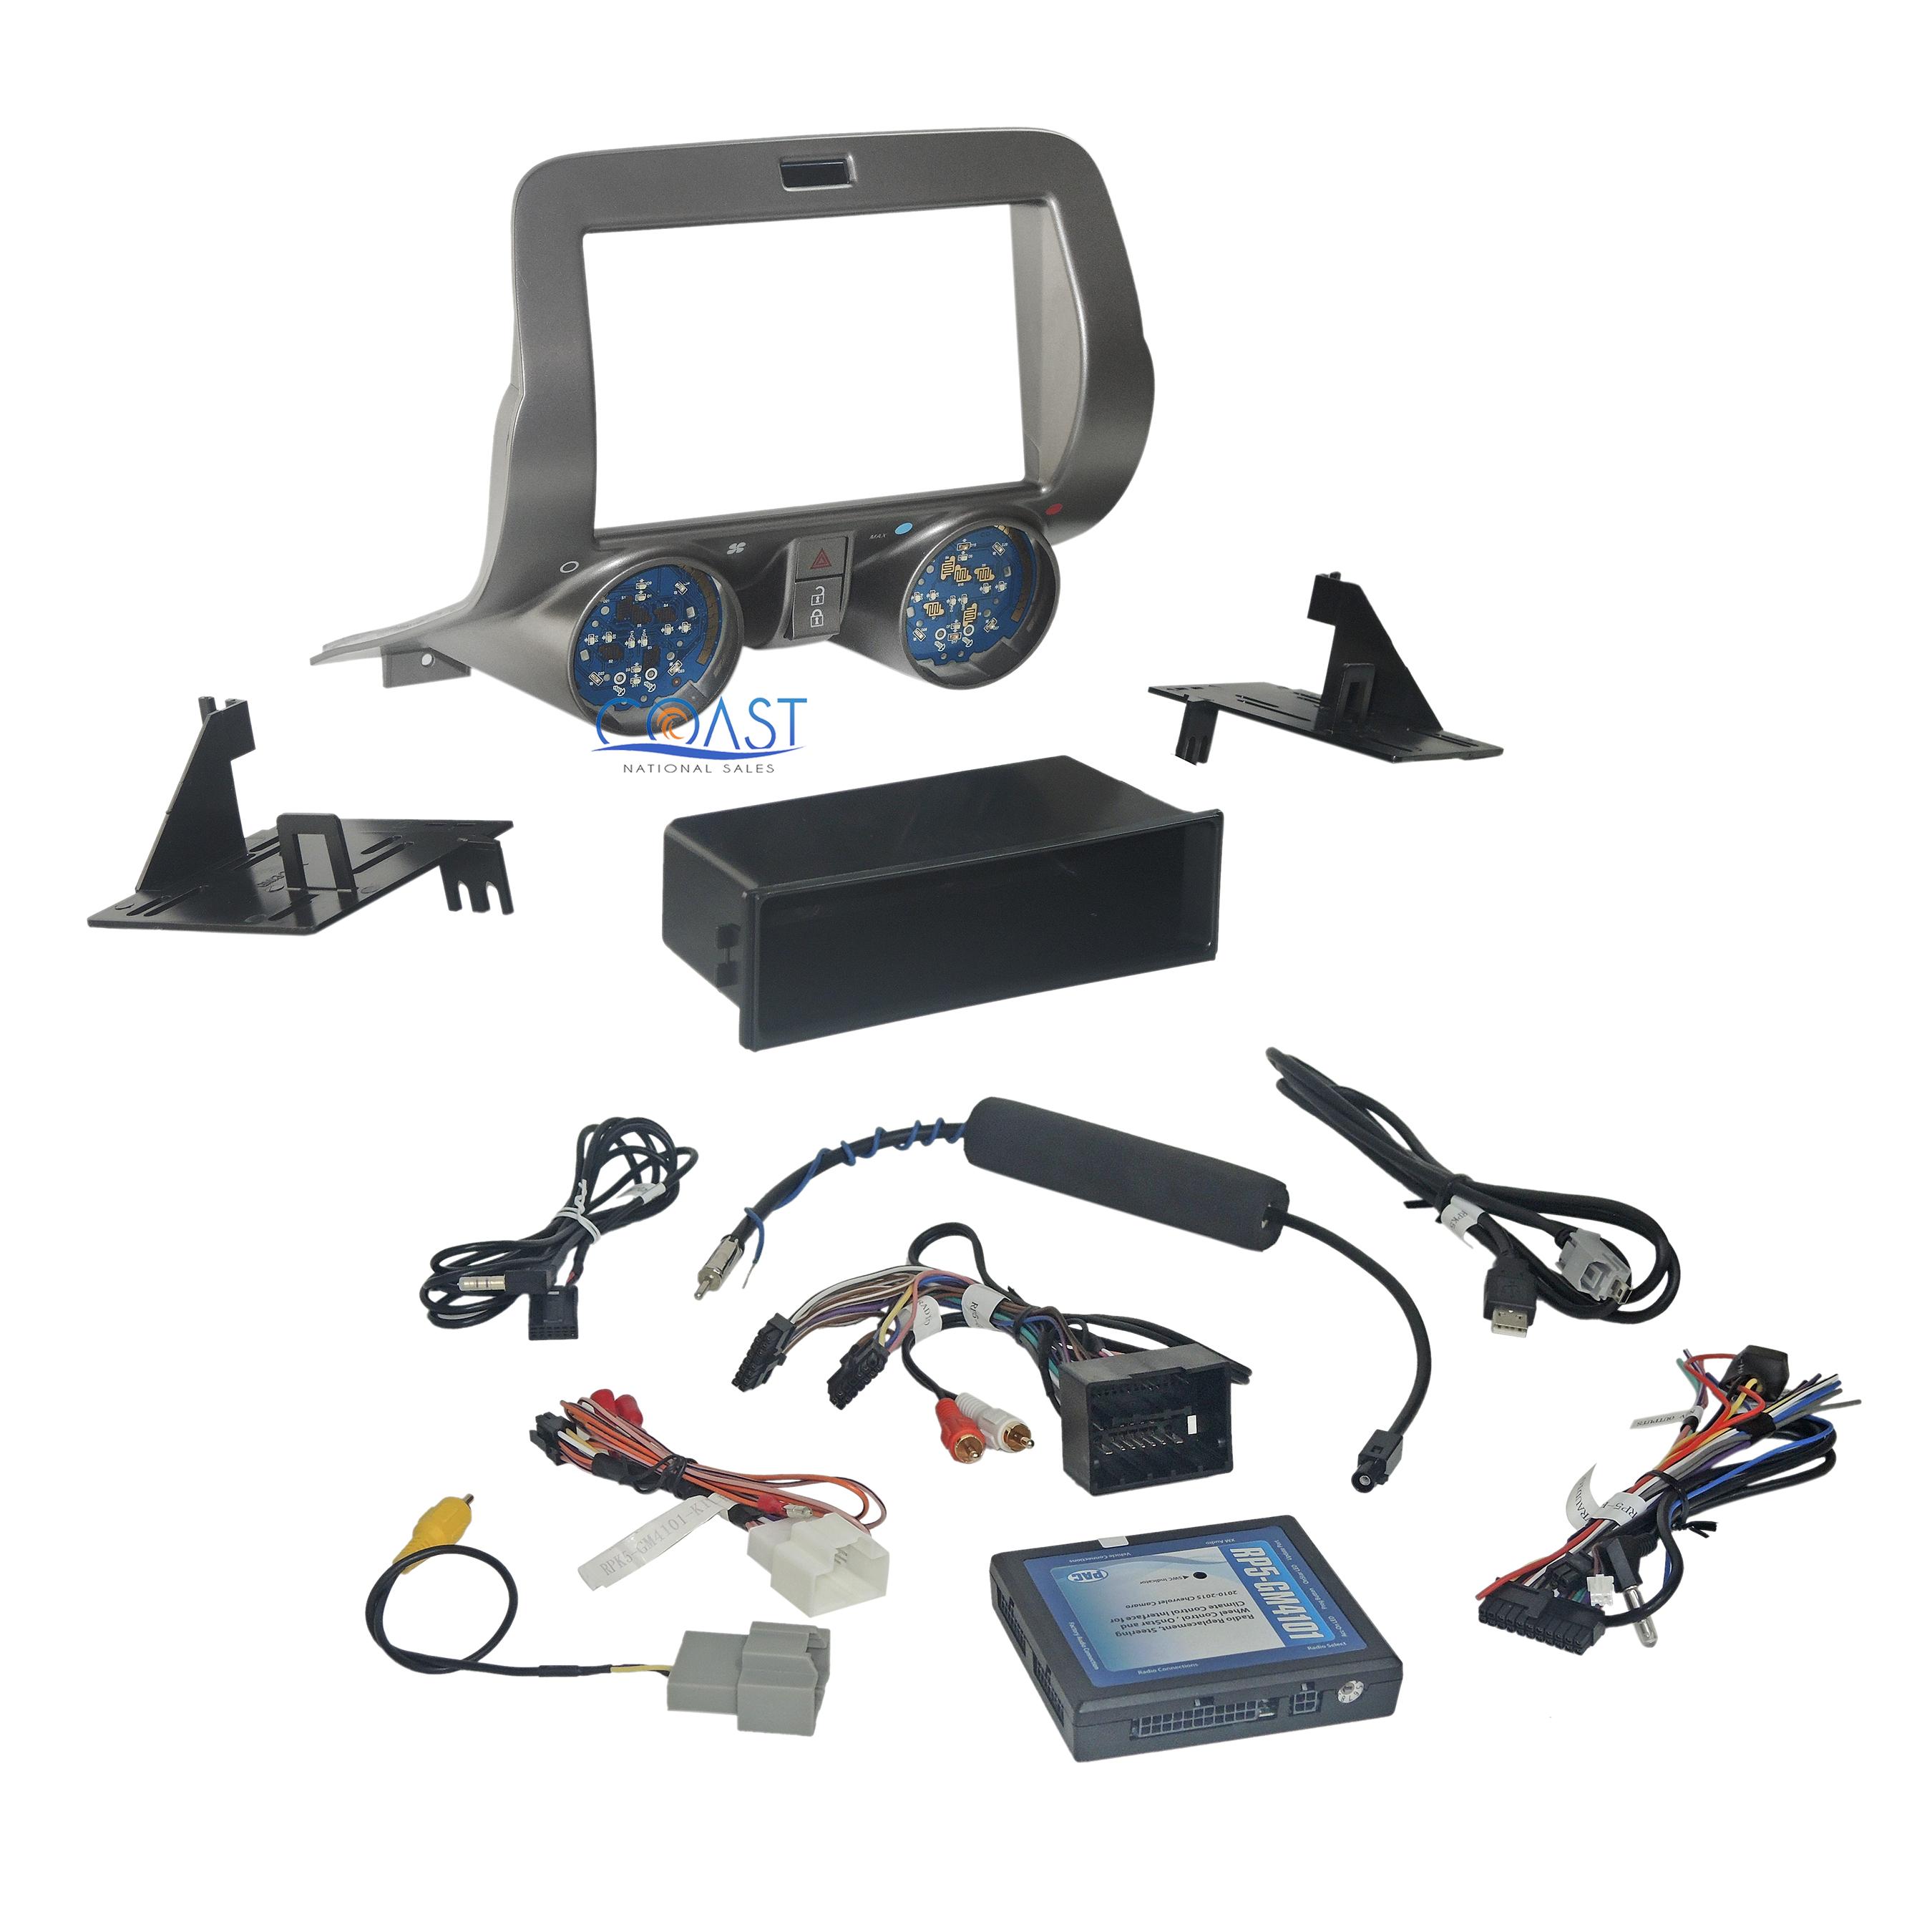 pac audio complete car radio dash kit harness for 2010. Black Bedroom Furniture Sets. Home Design Ideas